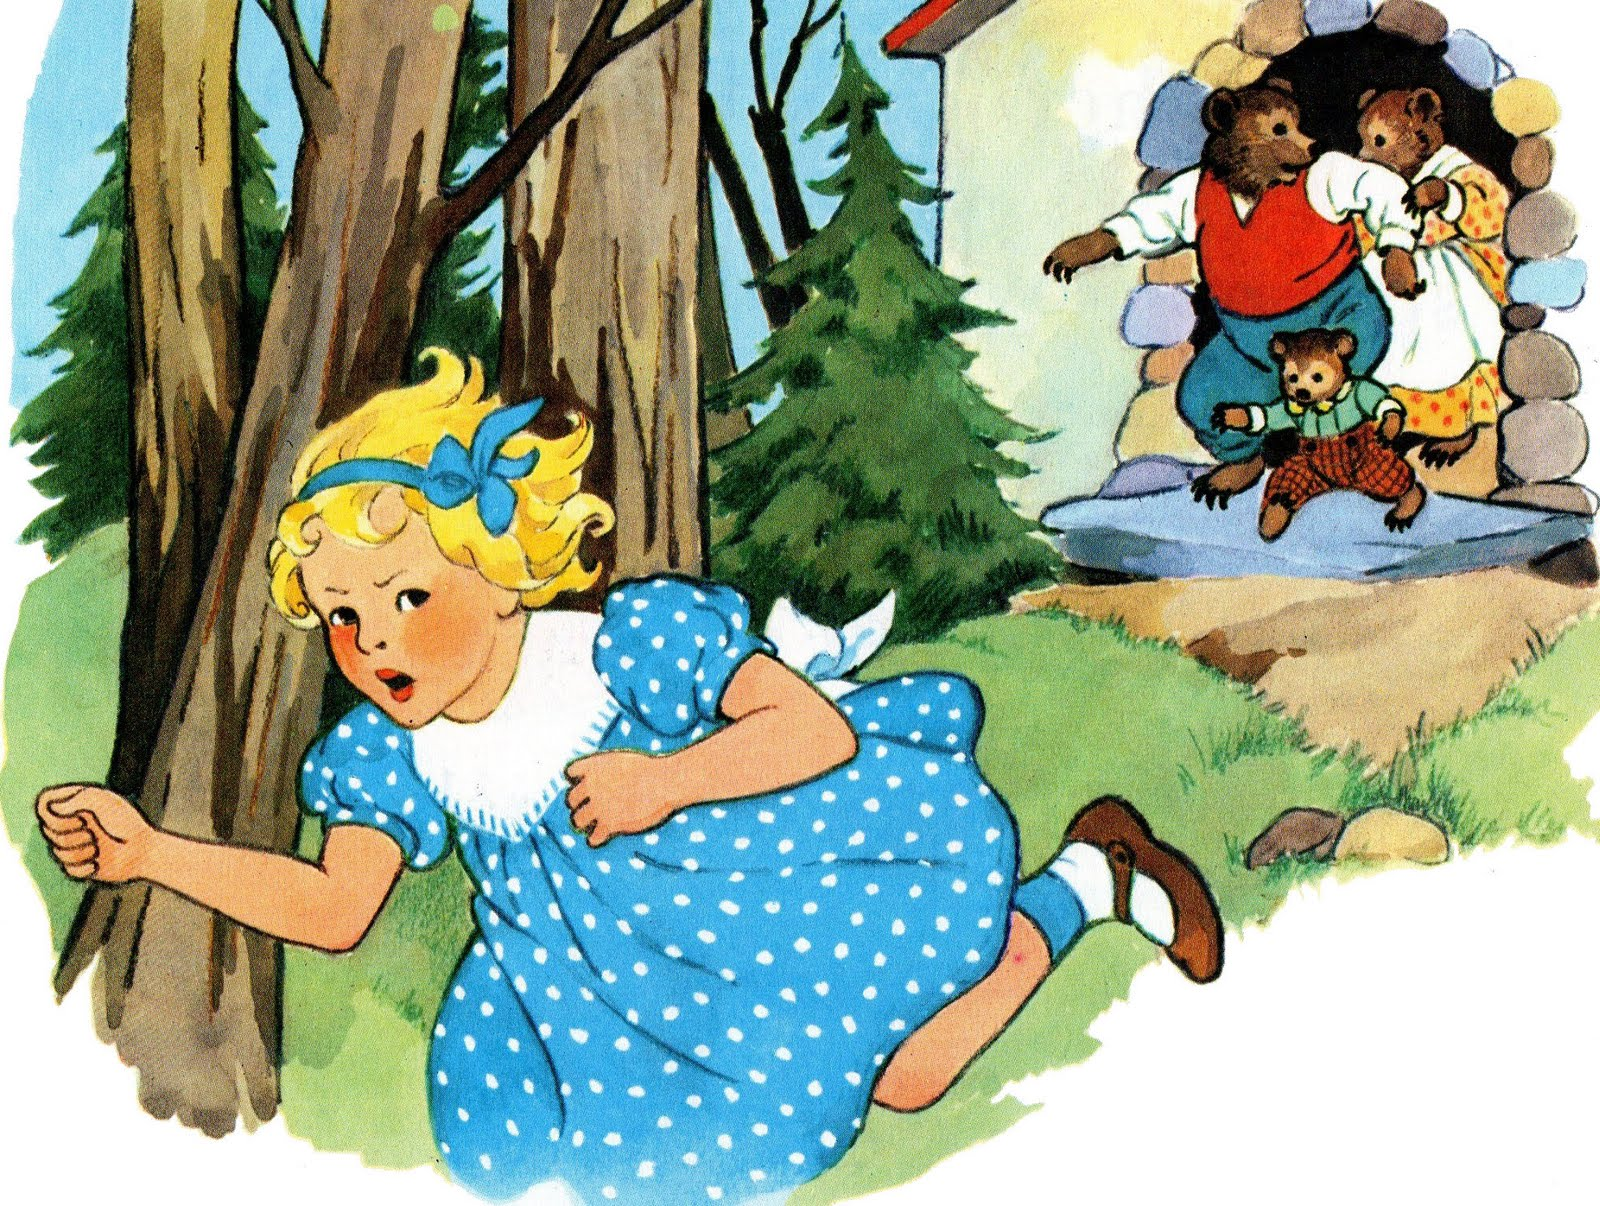 goldilocks and the three bears stories for kids